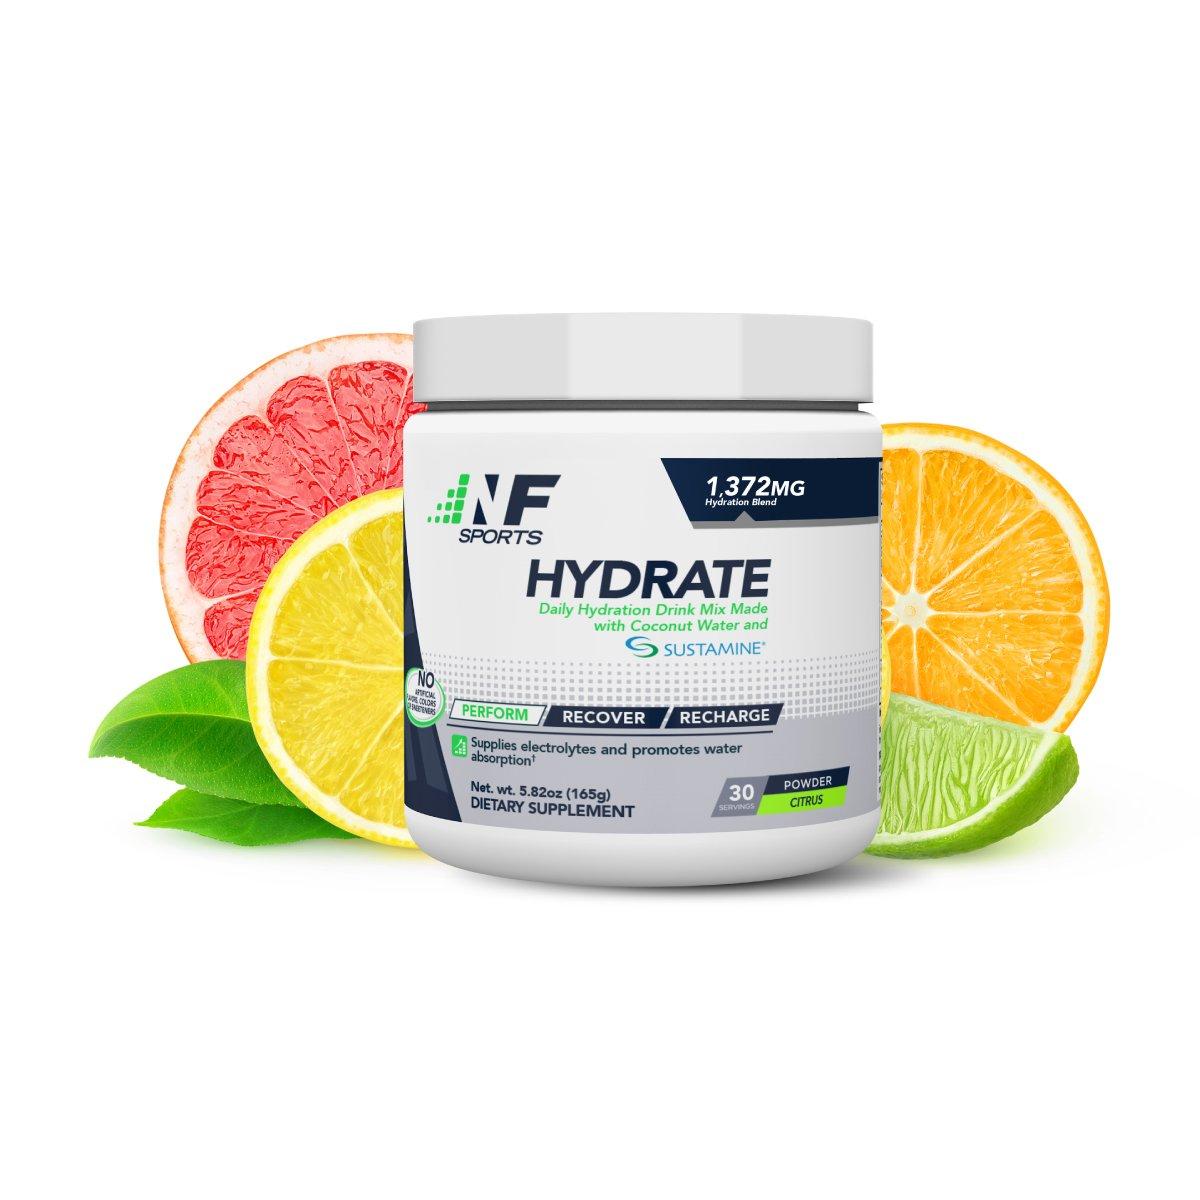 Image of Hydrate Citrus Powder